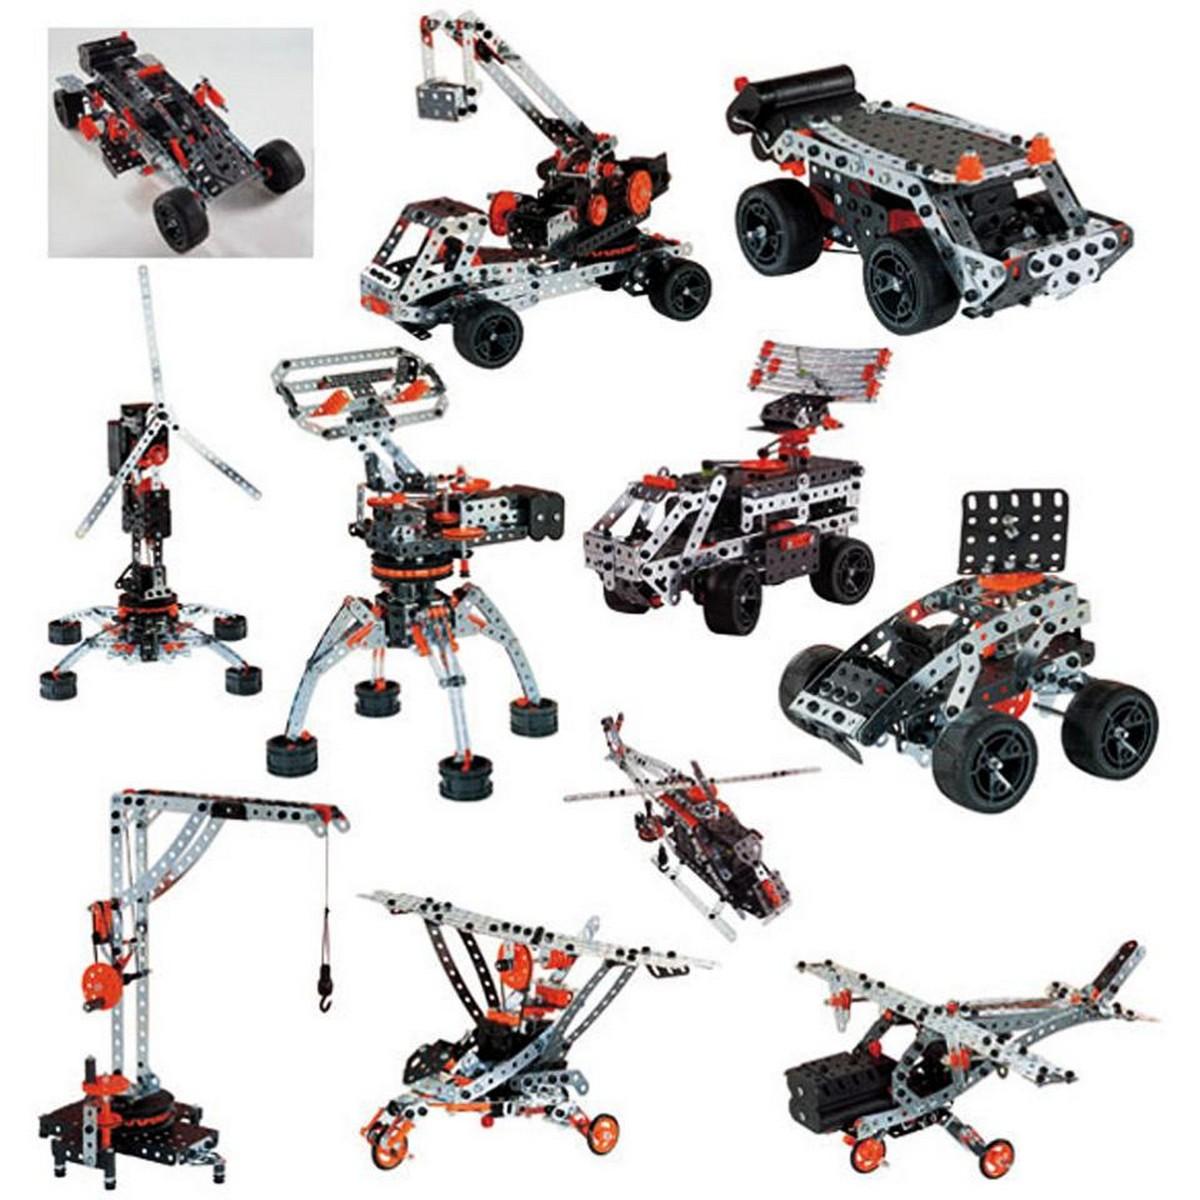 Mechanics Tool Vehicles Building Set (25 Models)